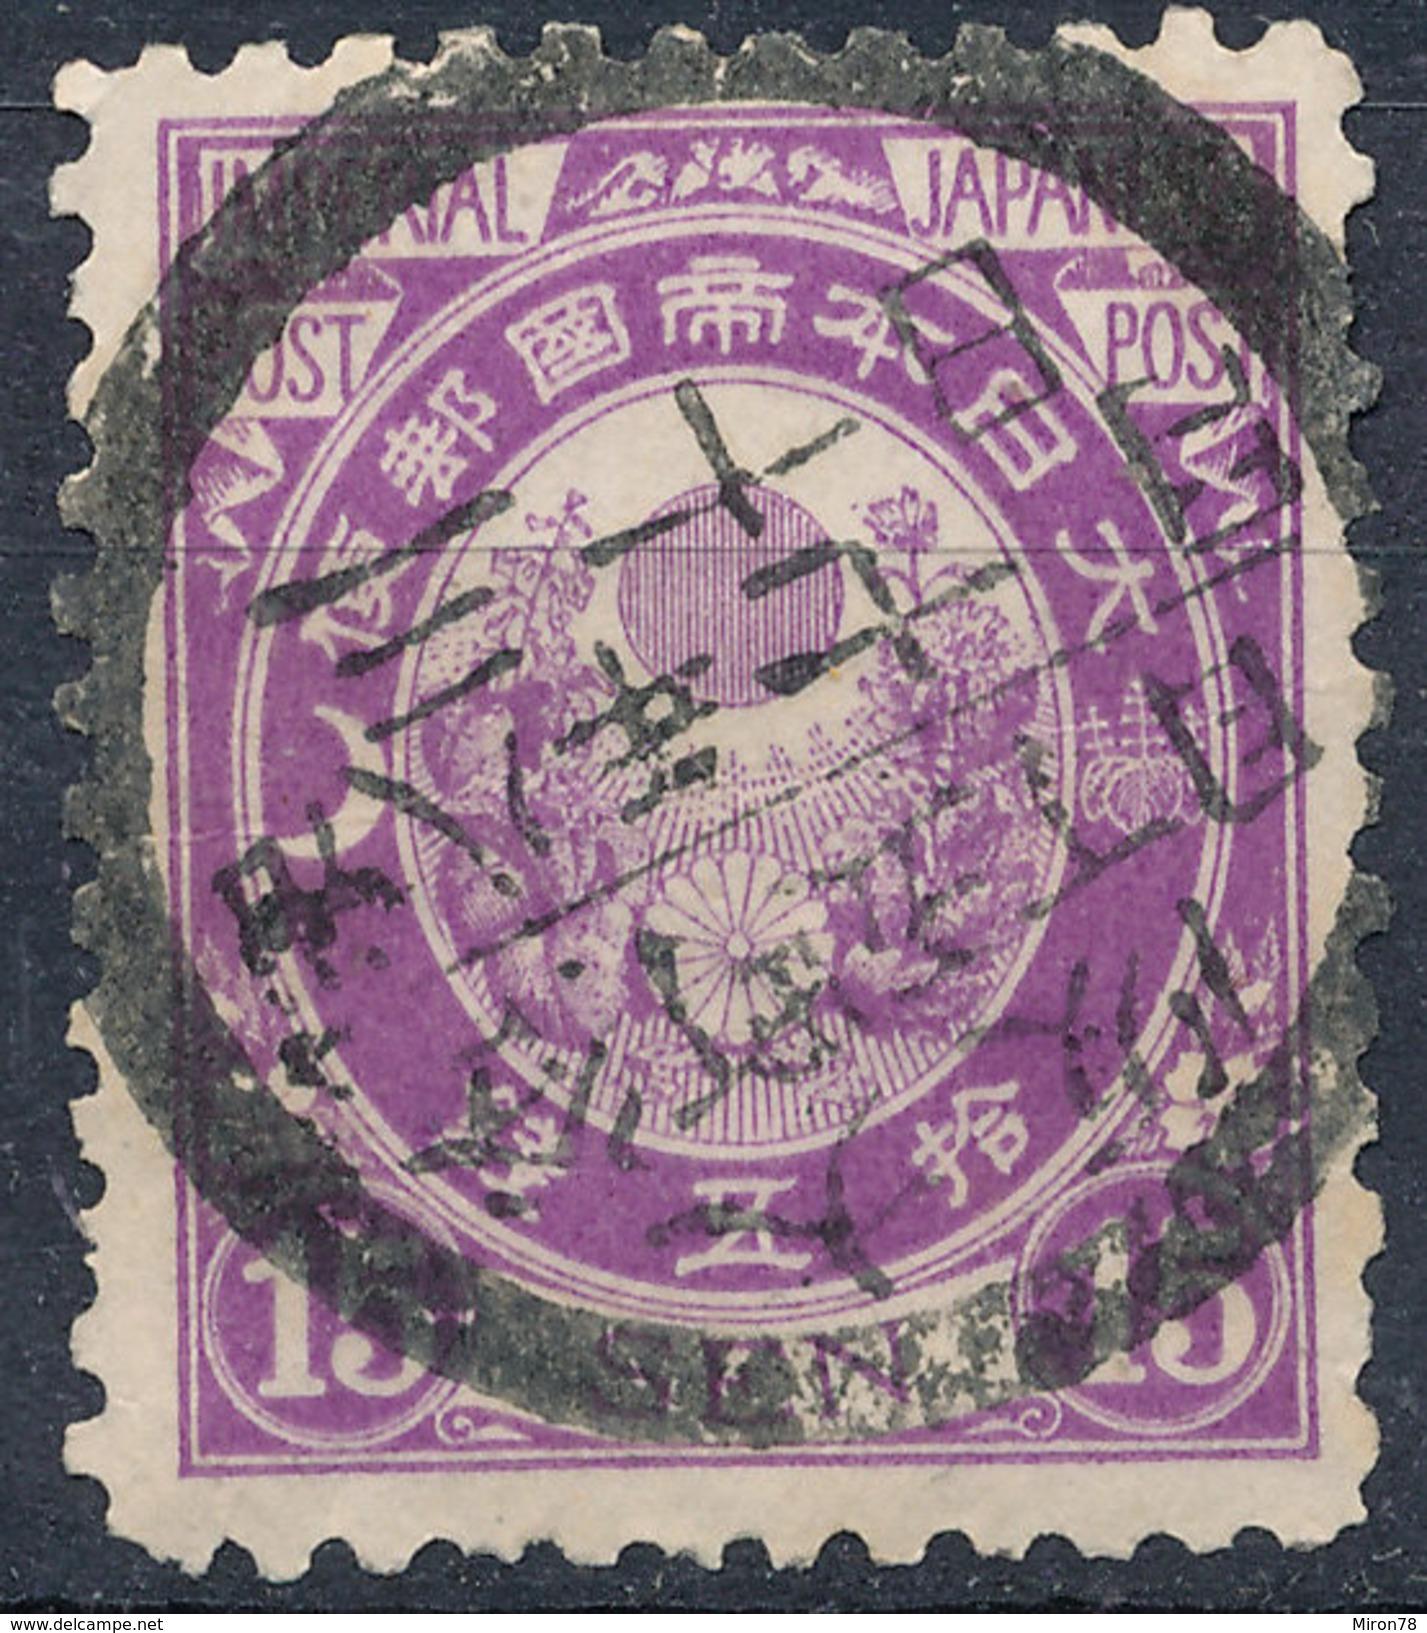 Stamp Japan 1888 15s Used Fancy Cancel Lot#51 - Japan